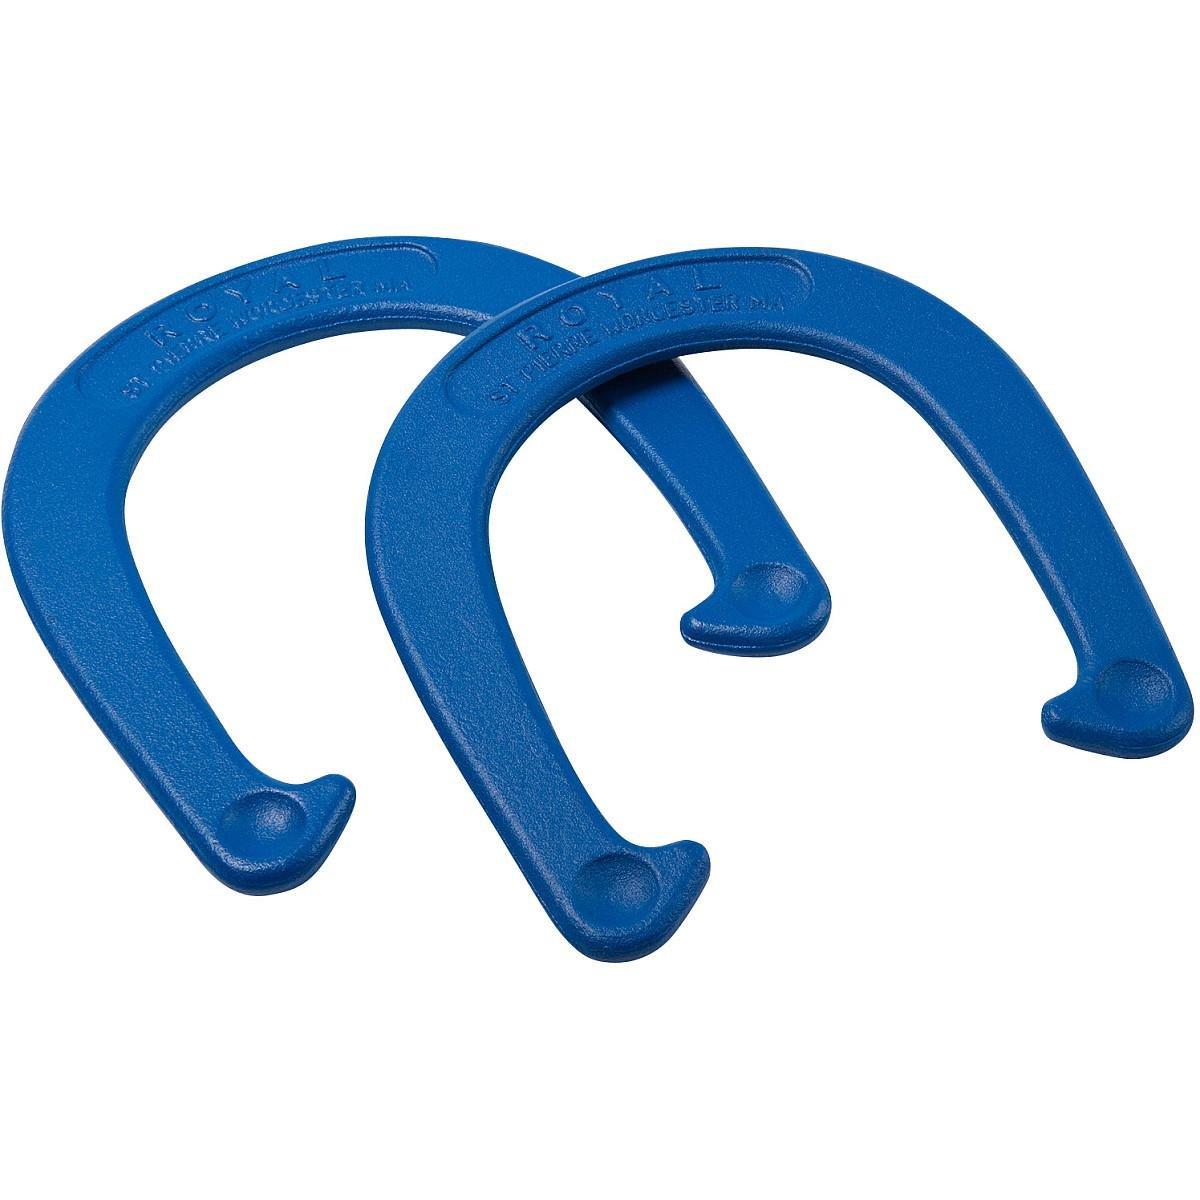 St Pierre Sports Royal Horseshoe (1-Pair), Blue